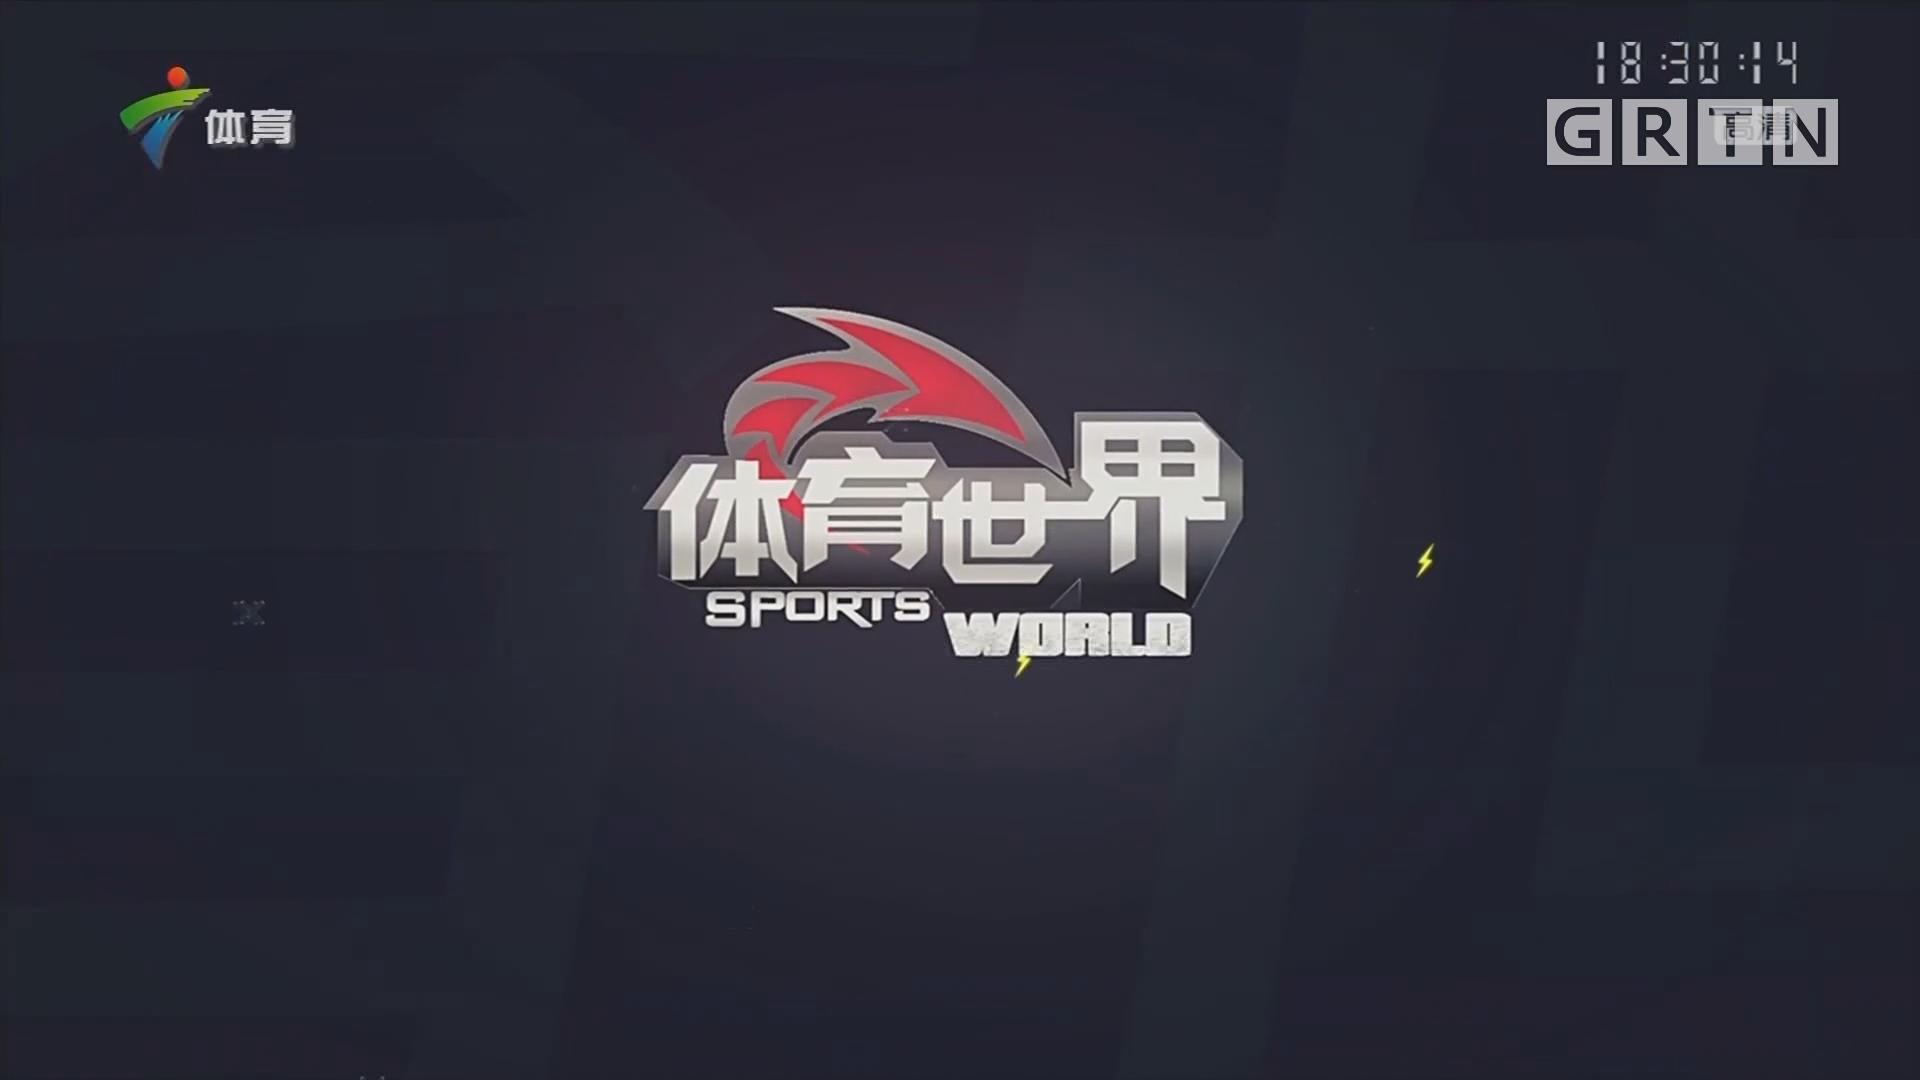 [HD][2019-03-15]体育世界:第15届夏季特殊奥林匹克运动会开幕